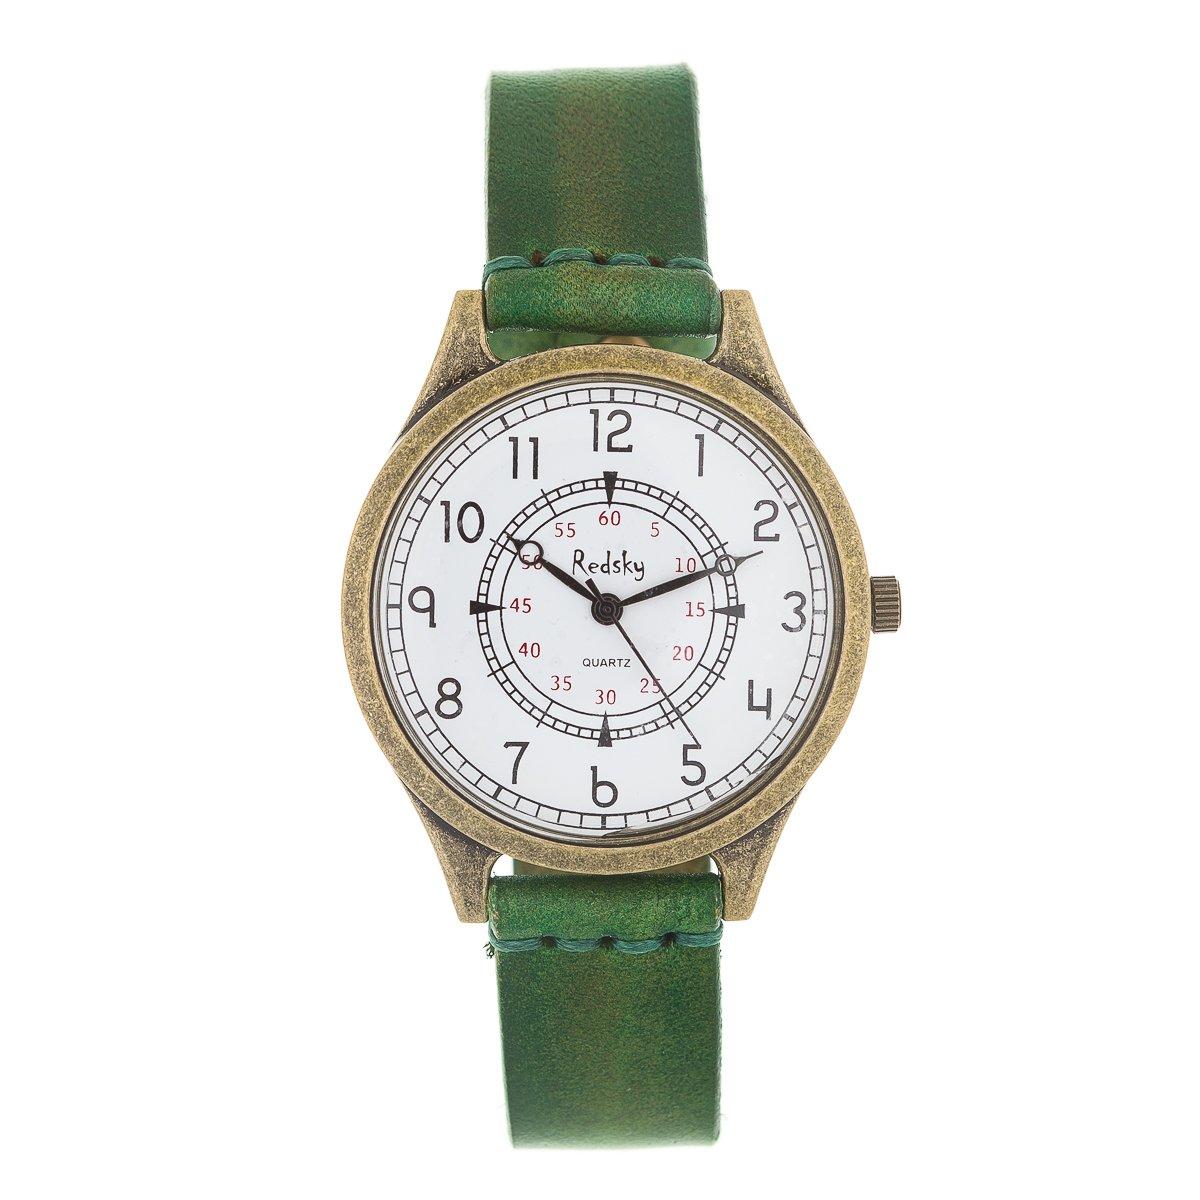 Amazon.com: Women Watch on Sale: Elegant Fashion European Design Leather Strap Woman Watches (RGC02): Watches